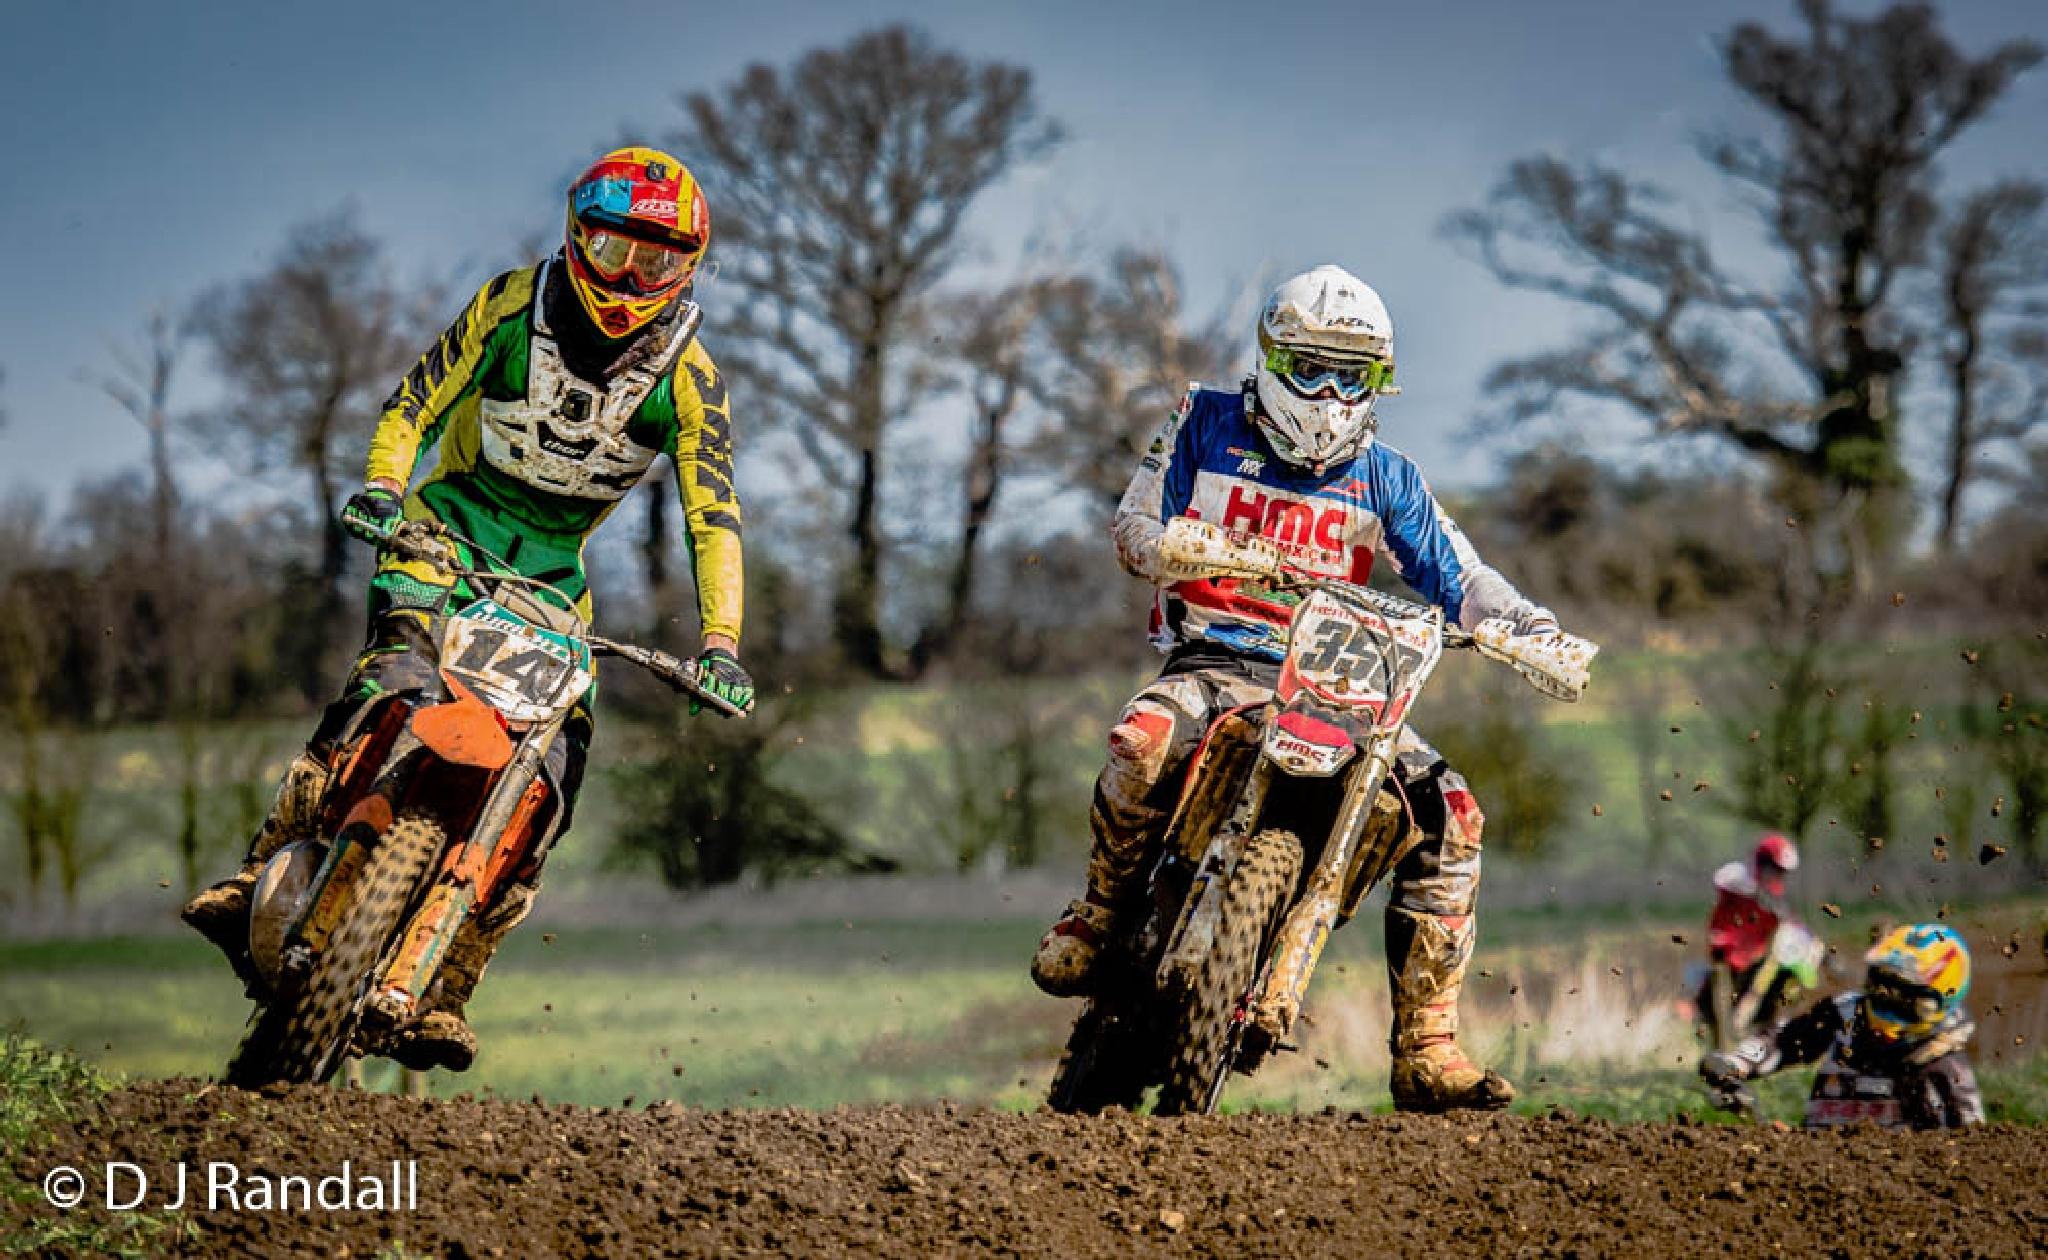 Motocrossers at Toddington Bedfordshire by Albatroff